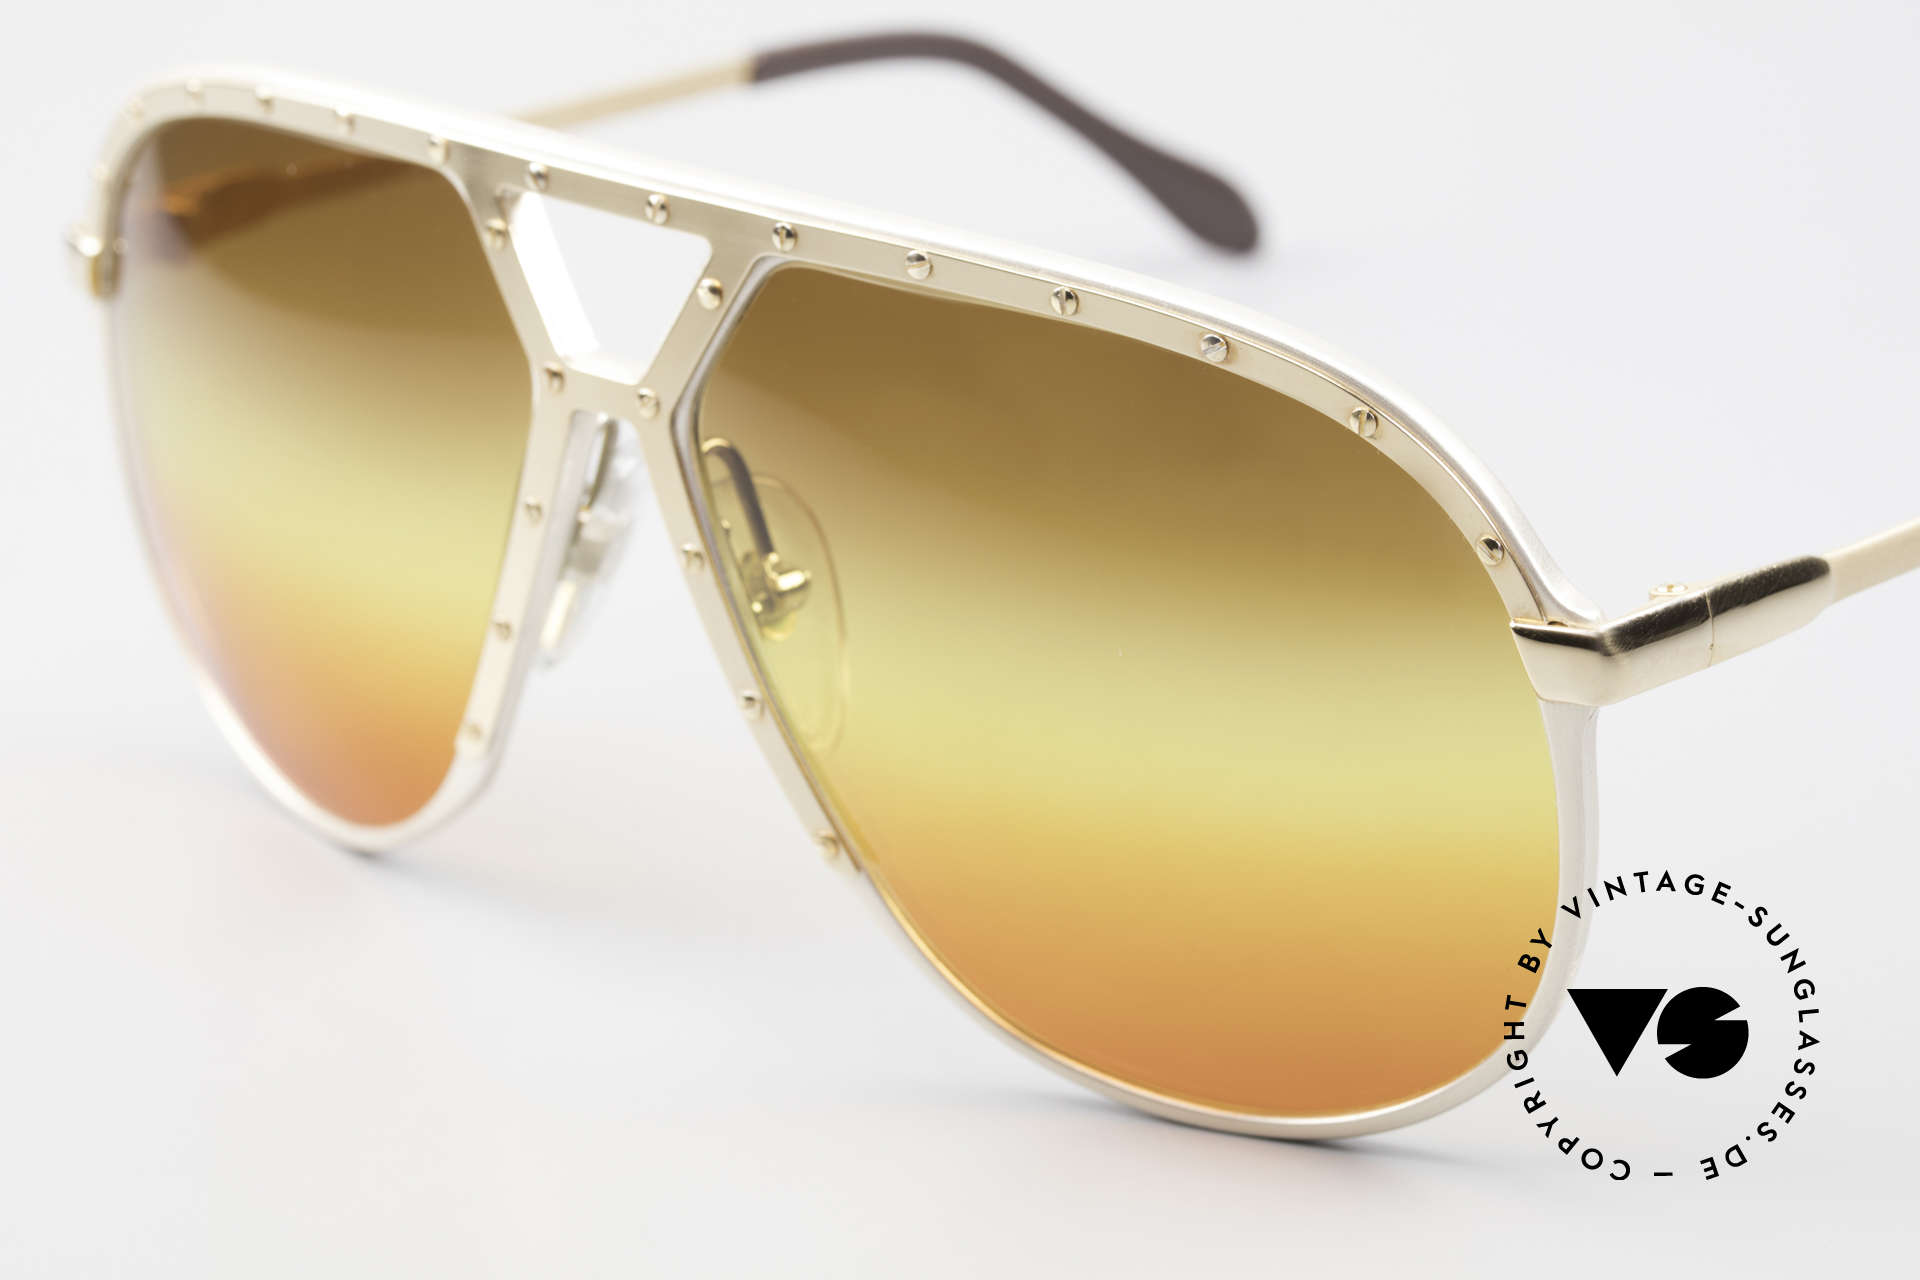 Alpina M1 80's Sunglasses West Germany, customized triple-gradient sun lenses 'desert sun', Made for Men